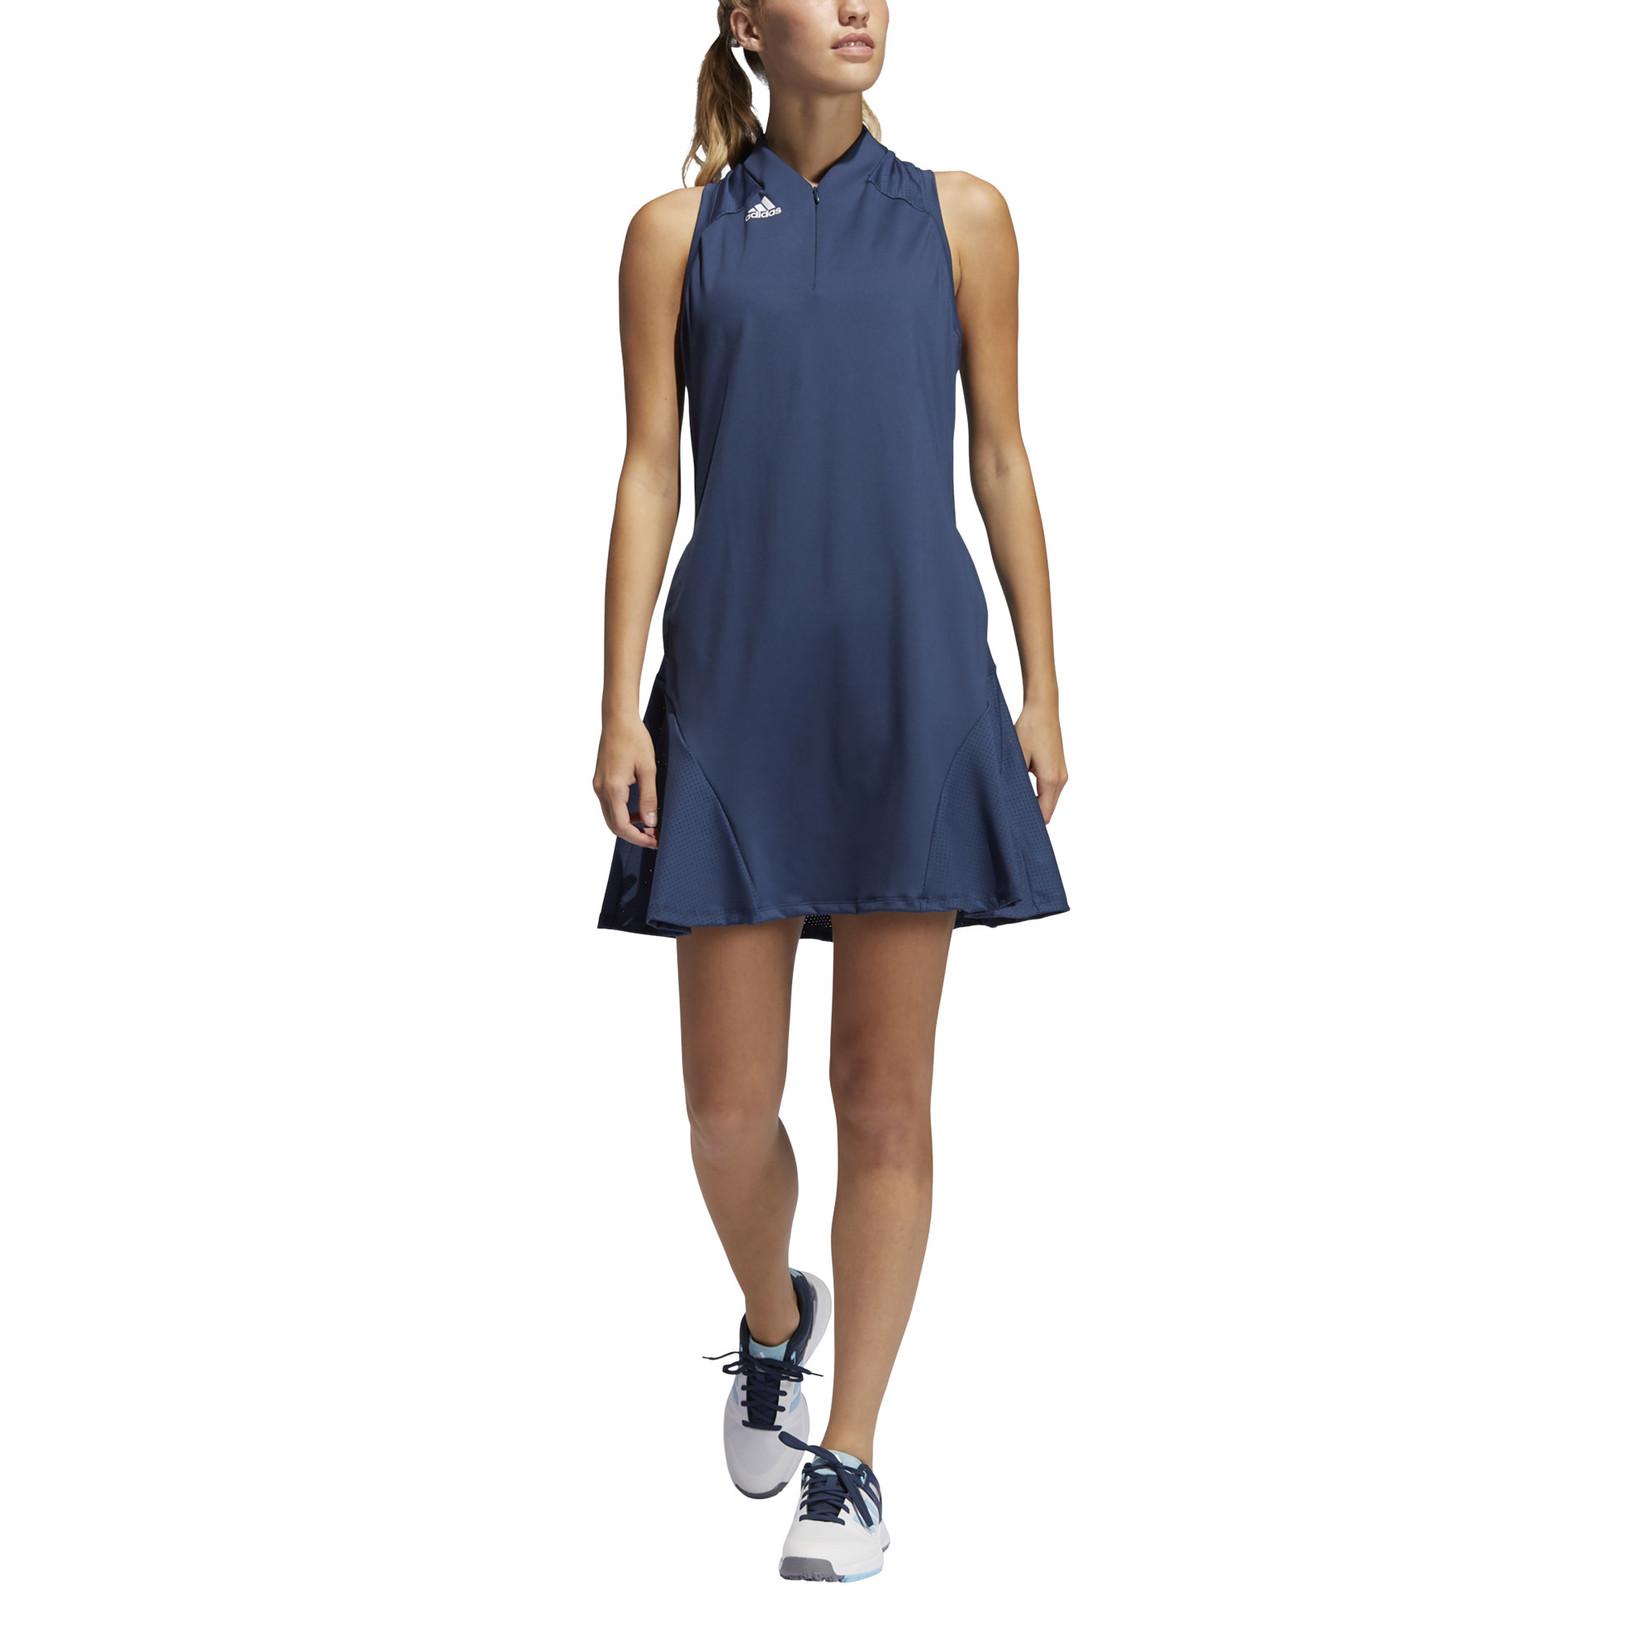 Adidas Adidas W Sport Dress - Navy